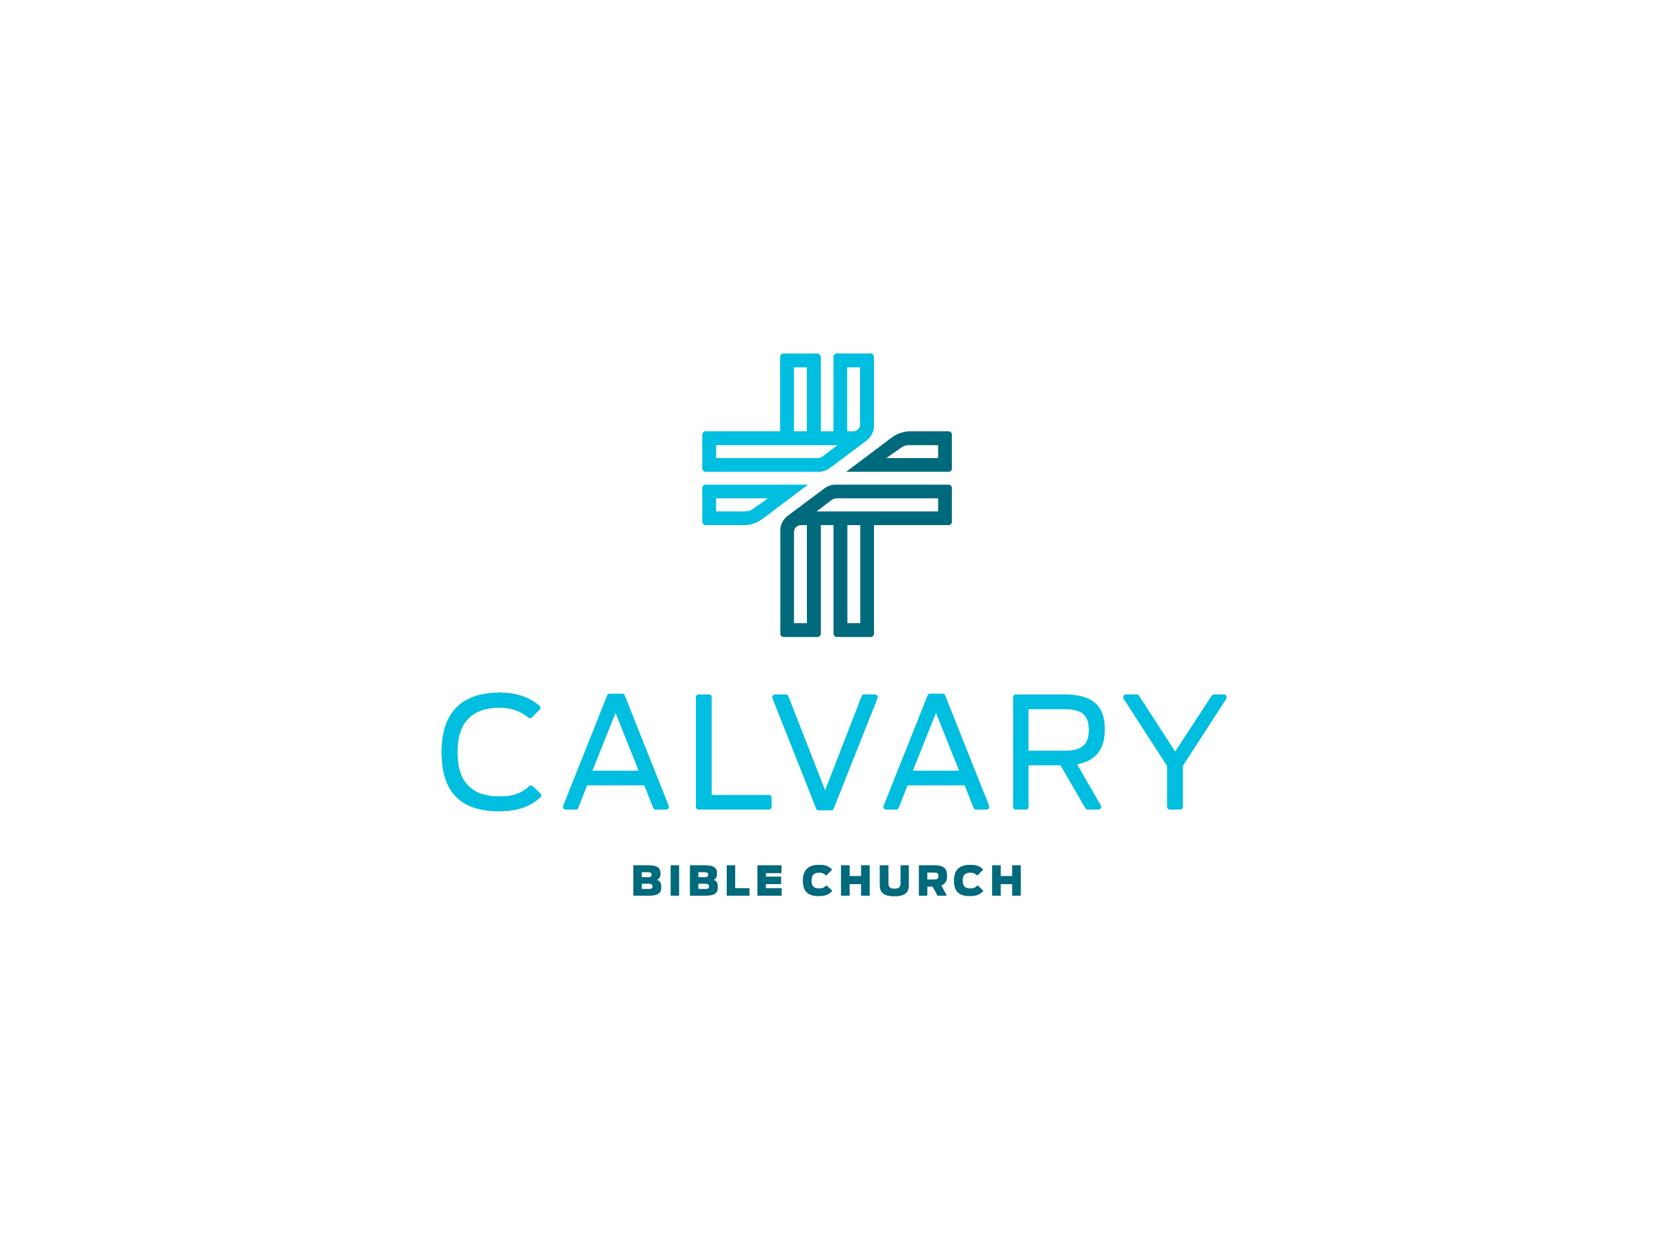 calvary_dribbble-02.png